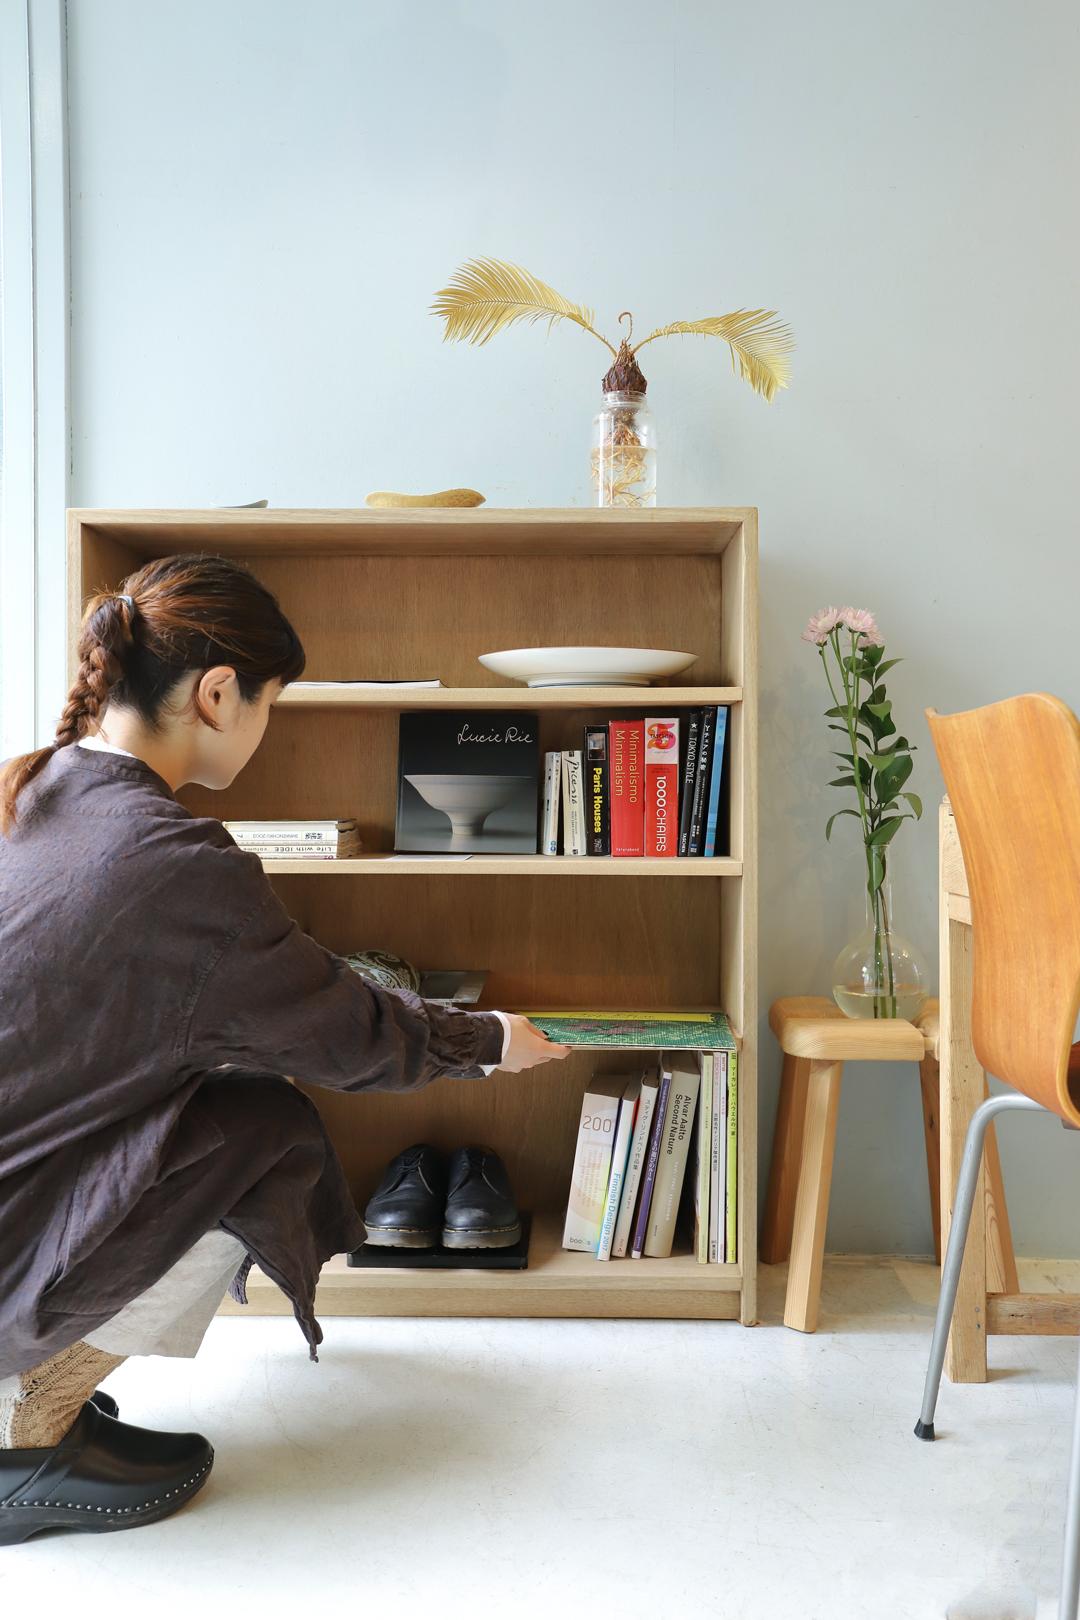 Japanese Vintage Book Shelf/ジャパンヴィンテージ ブックシェルフ 本棚 靴箱 収納 シャビーシック レトロモダン